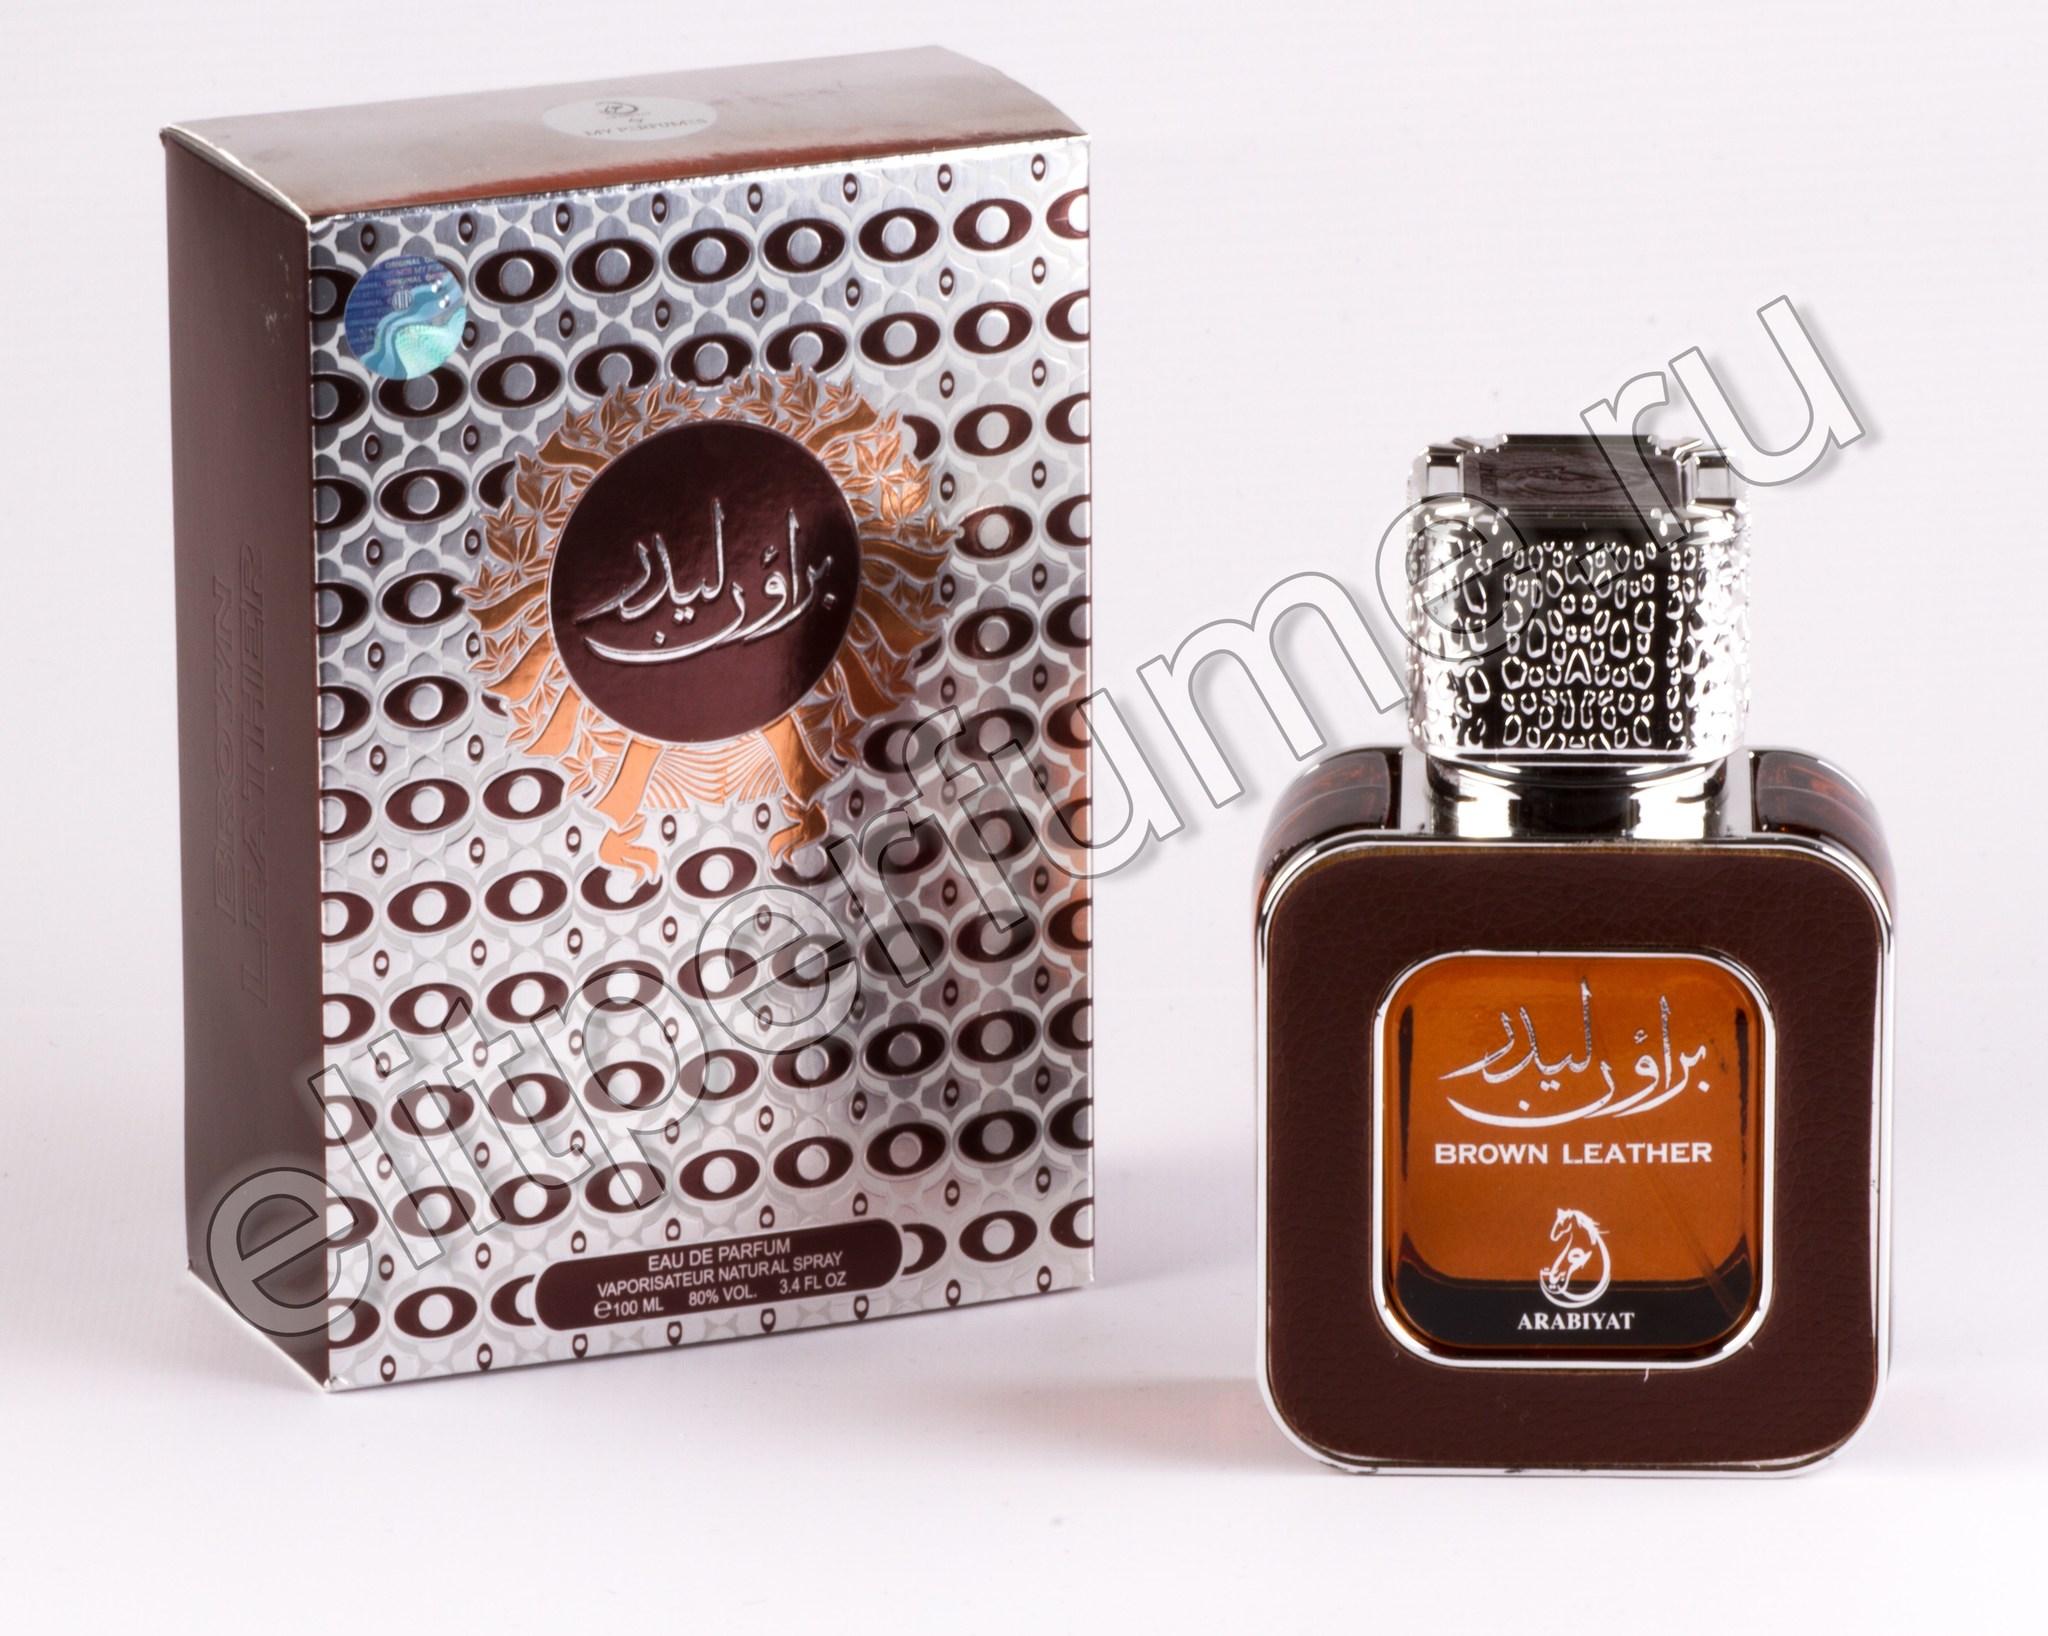 Brown leather  Браун лезер 100 мл спрей от Май Парфюмс My Perfumes